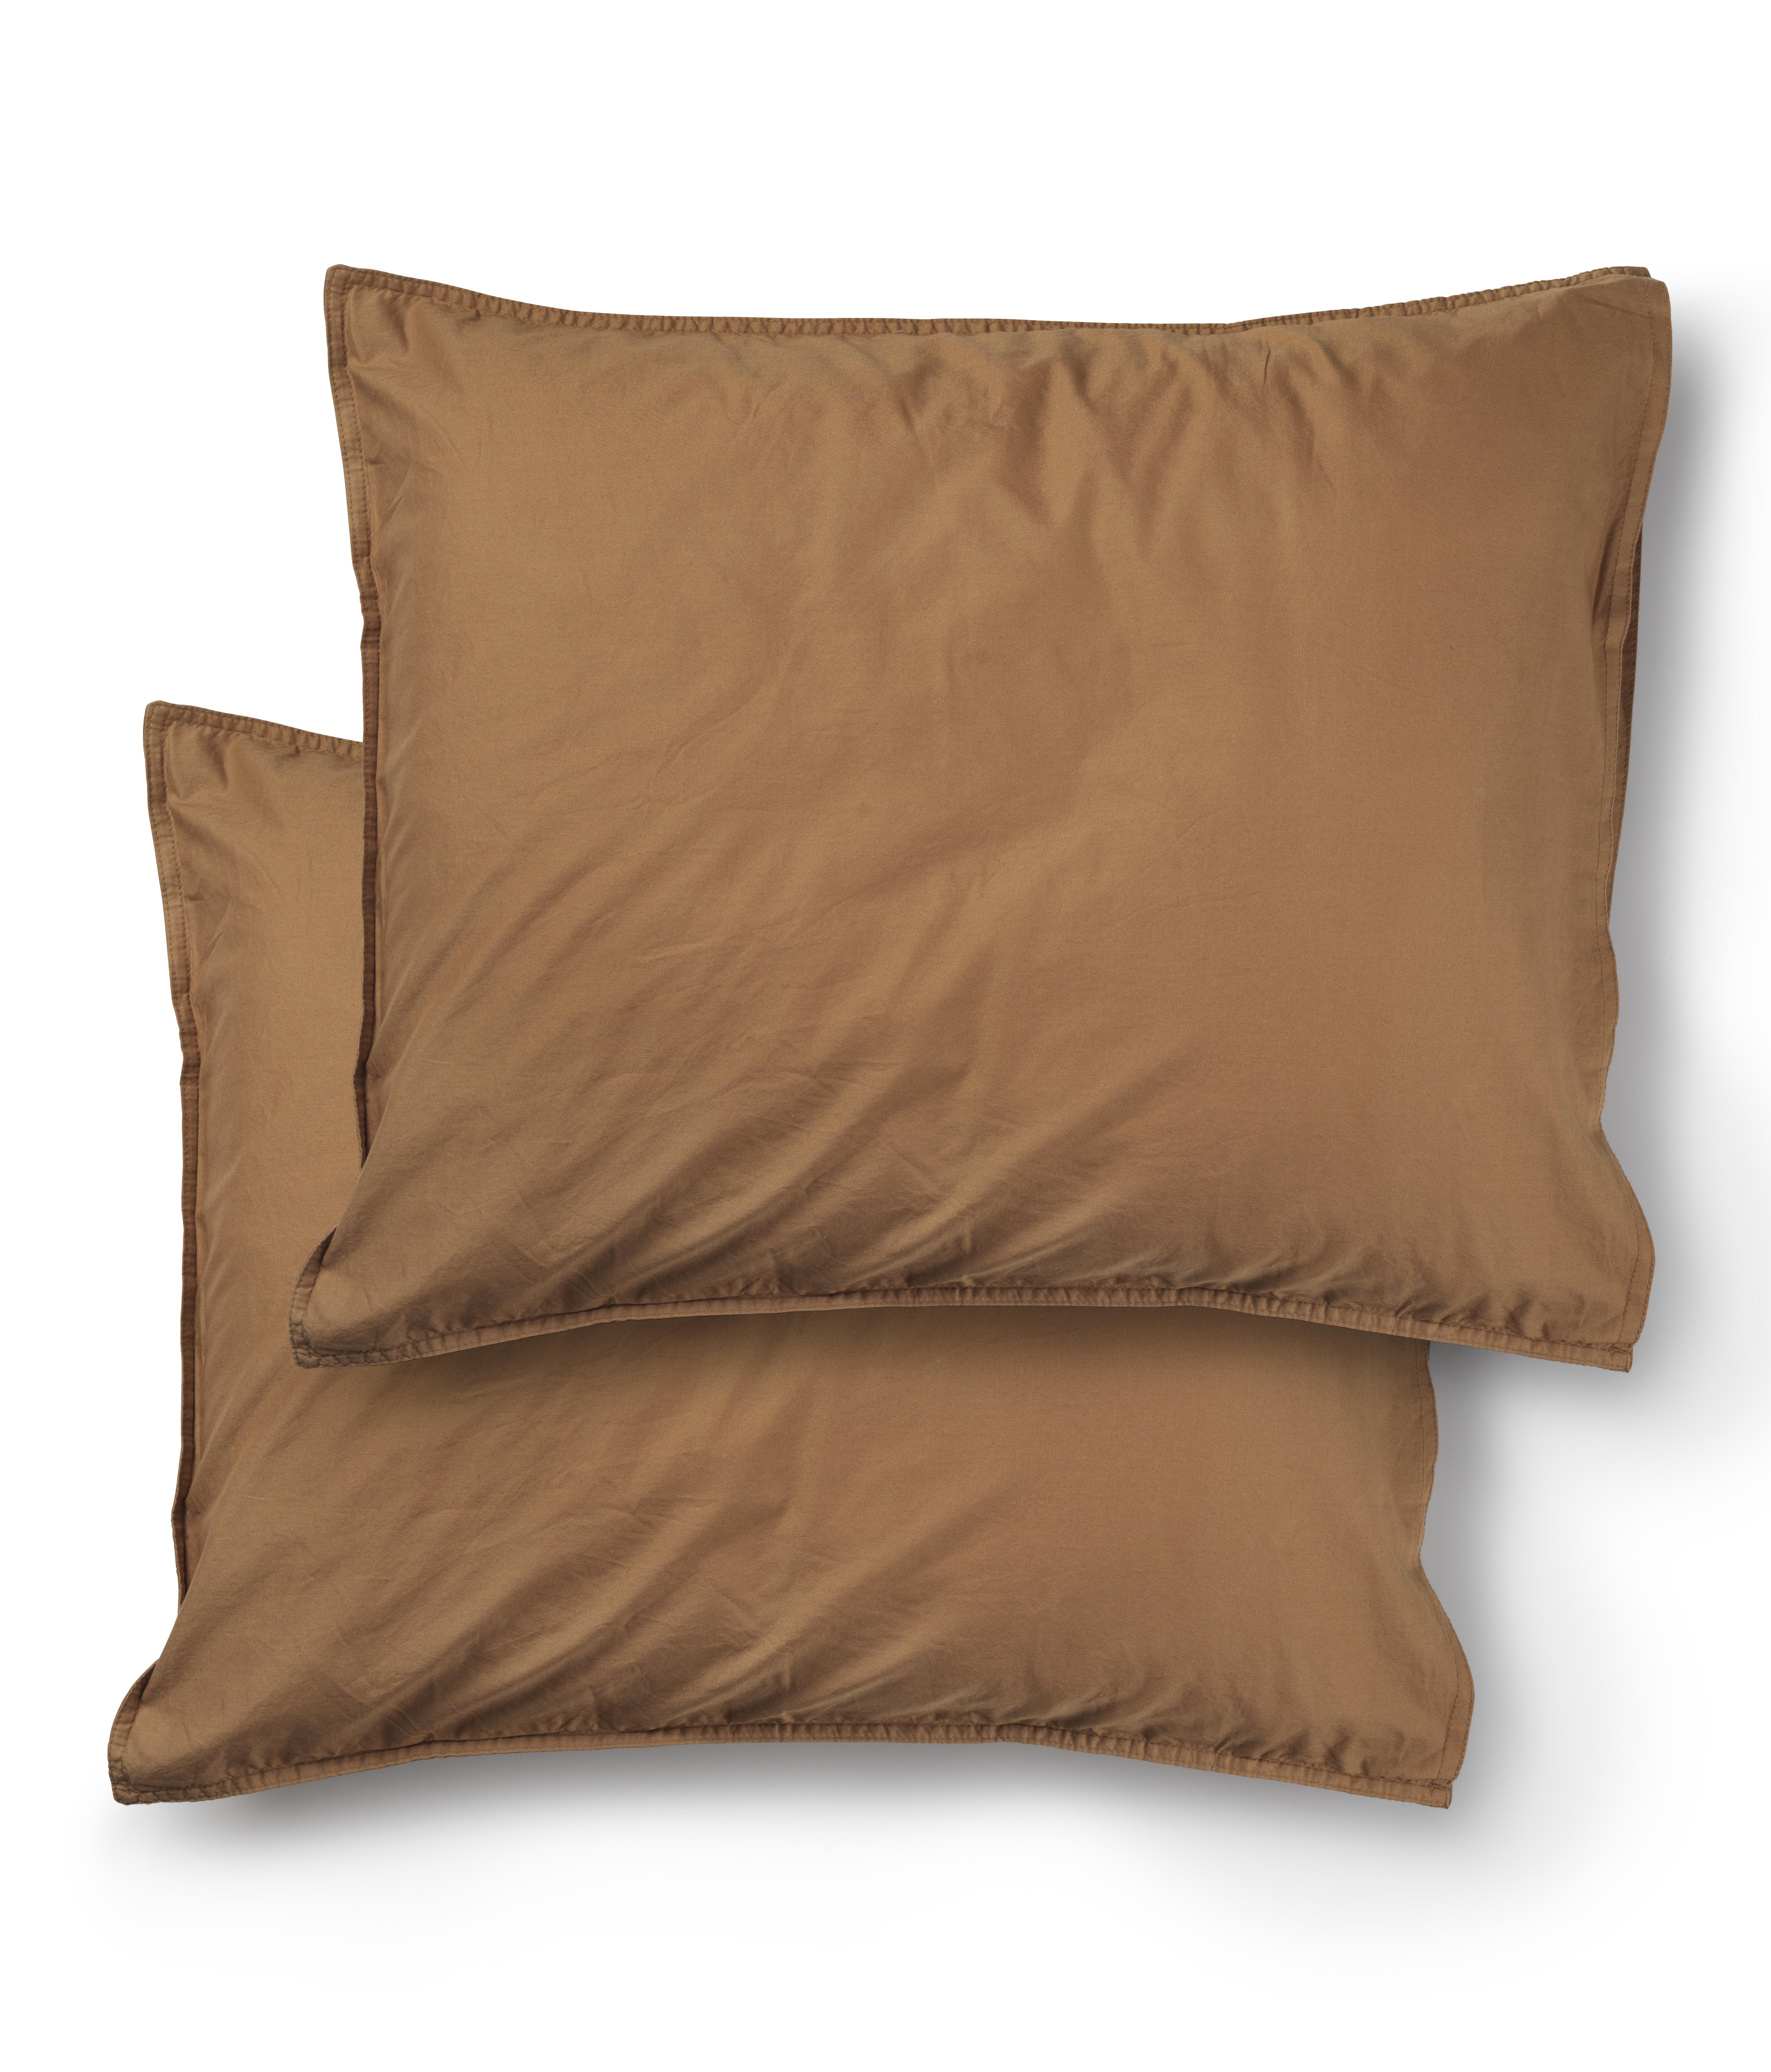 orngott-grupp-50x60-brun-dromedary-midnatt